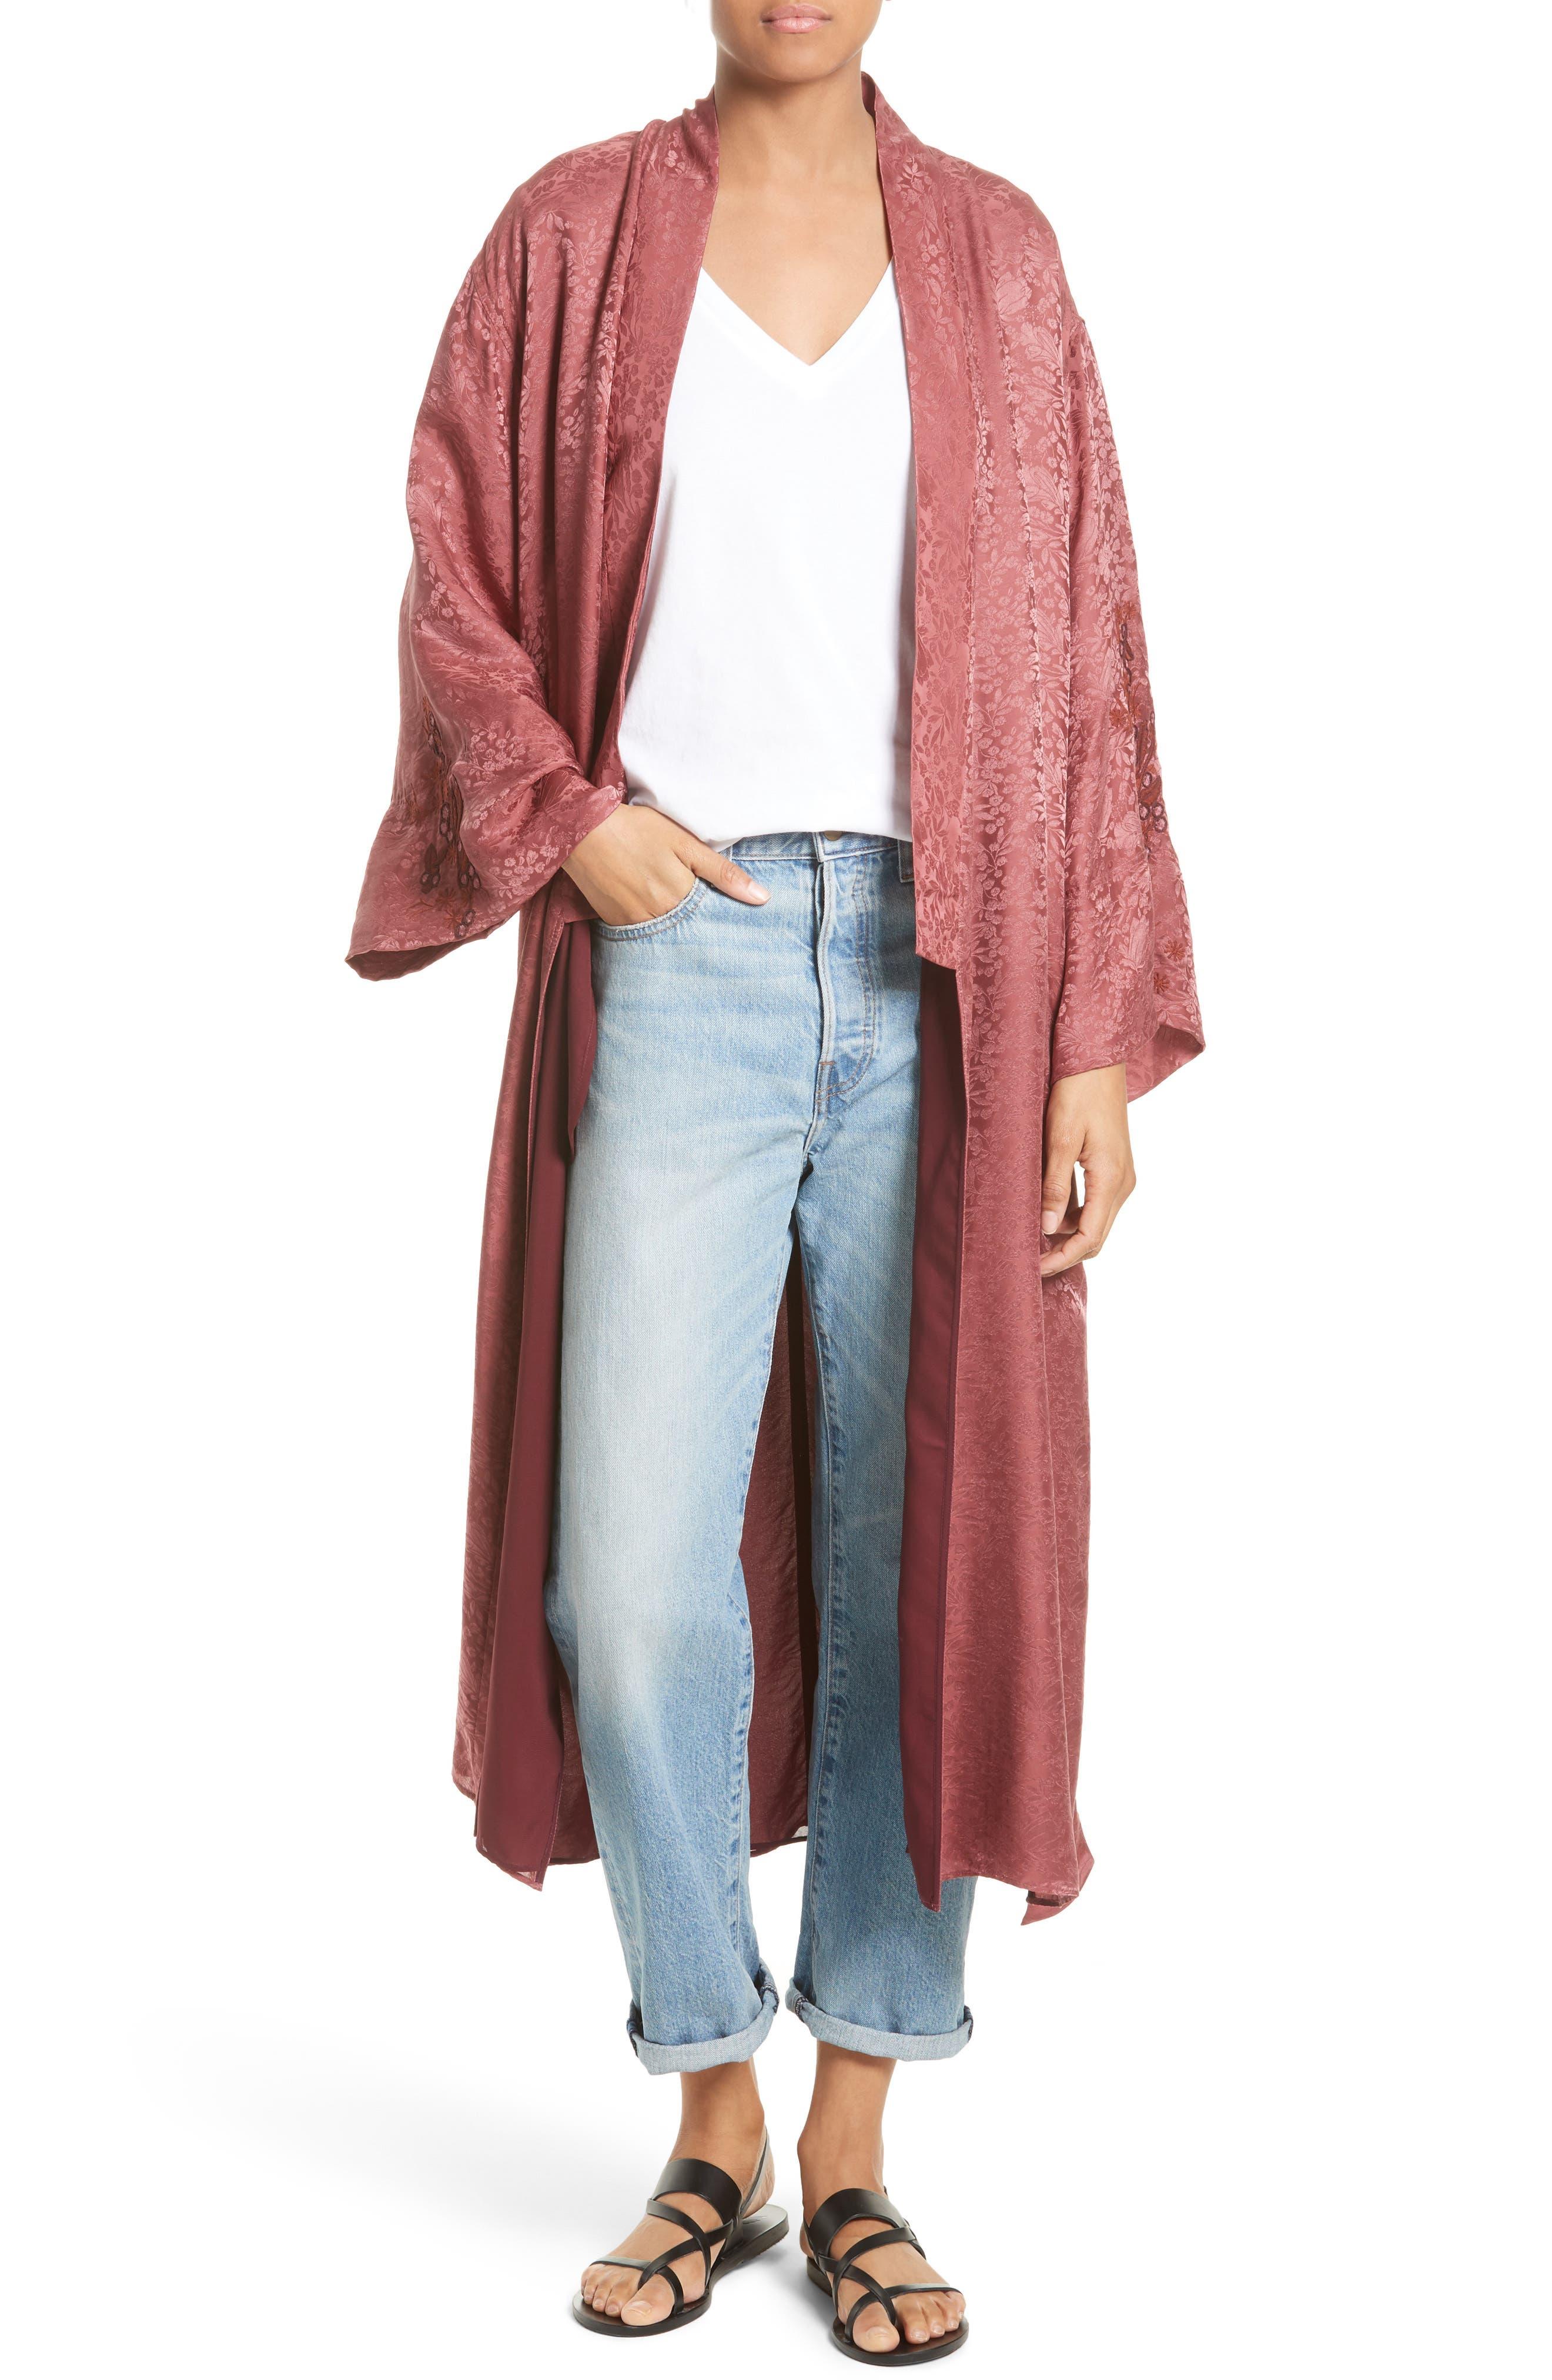 Tracey Jacquard Robe,                         Main,                         color, Rhubarb